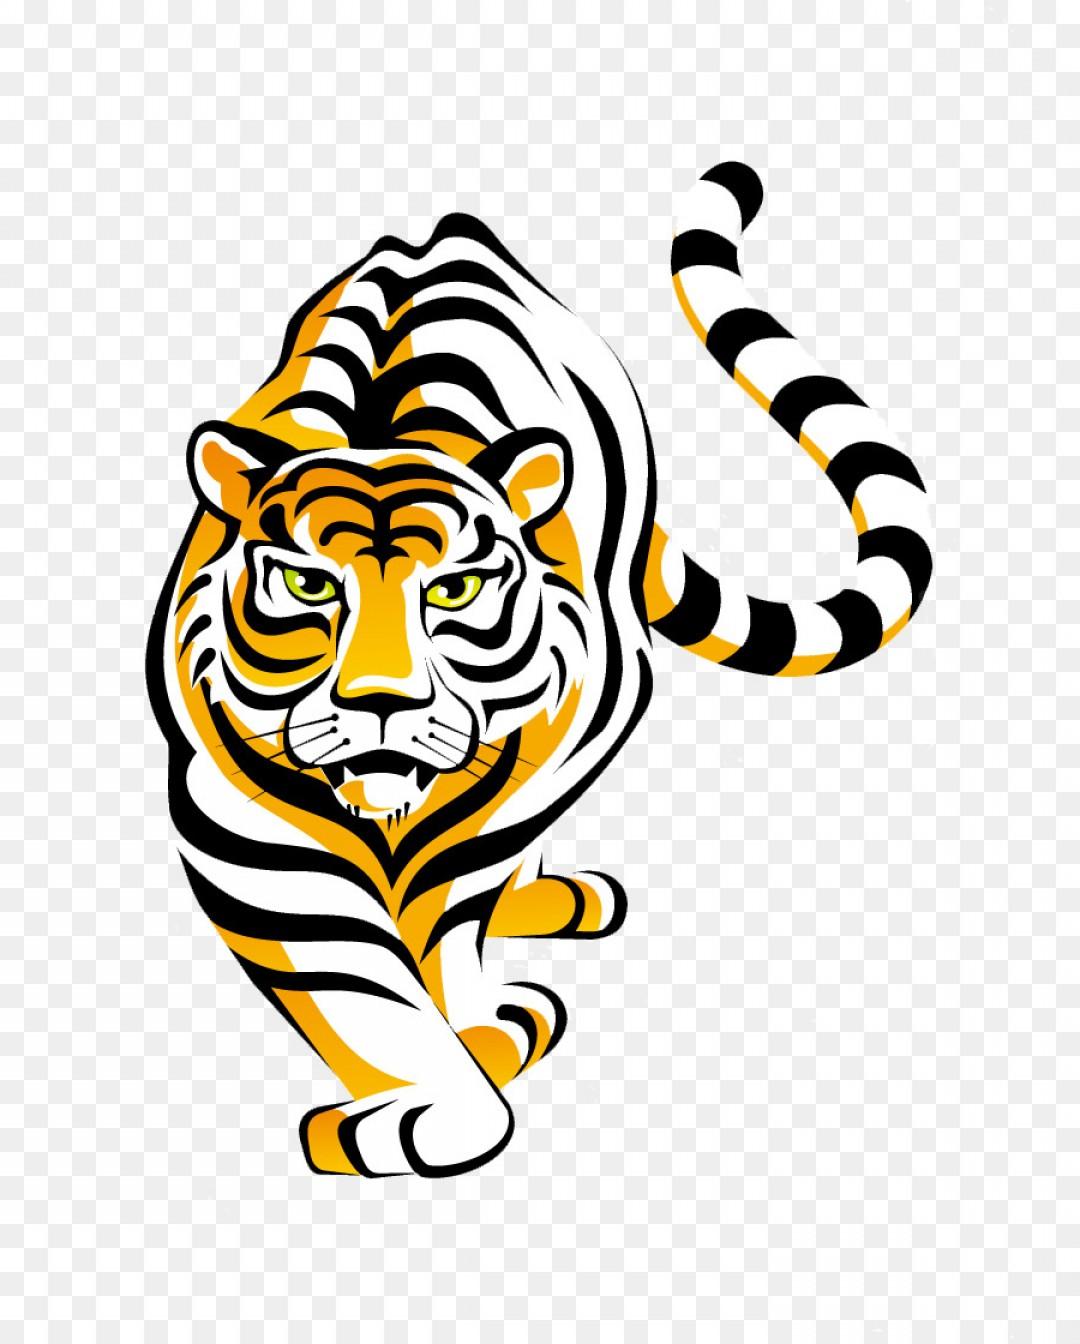 1080x1344 Png Tiger Photography Clip Art Tiger Vector Lazttweet